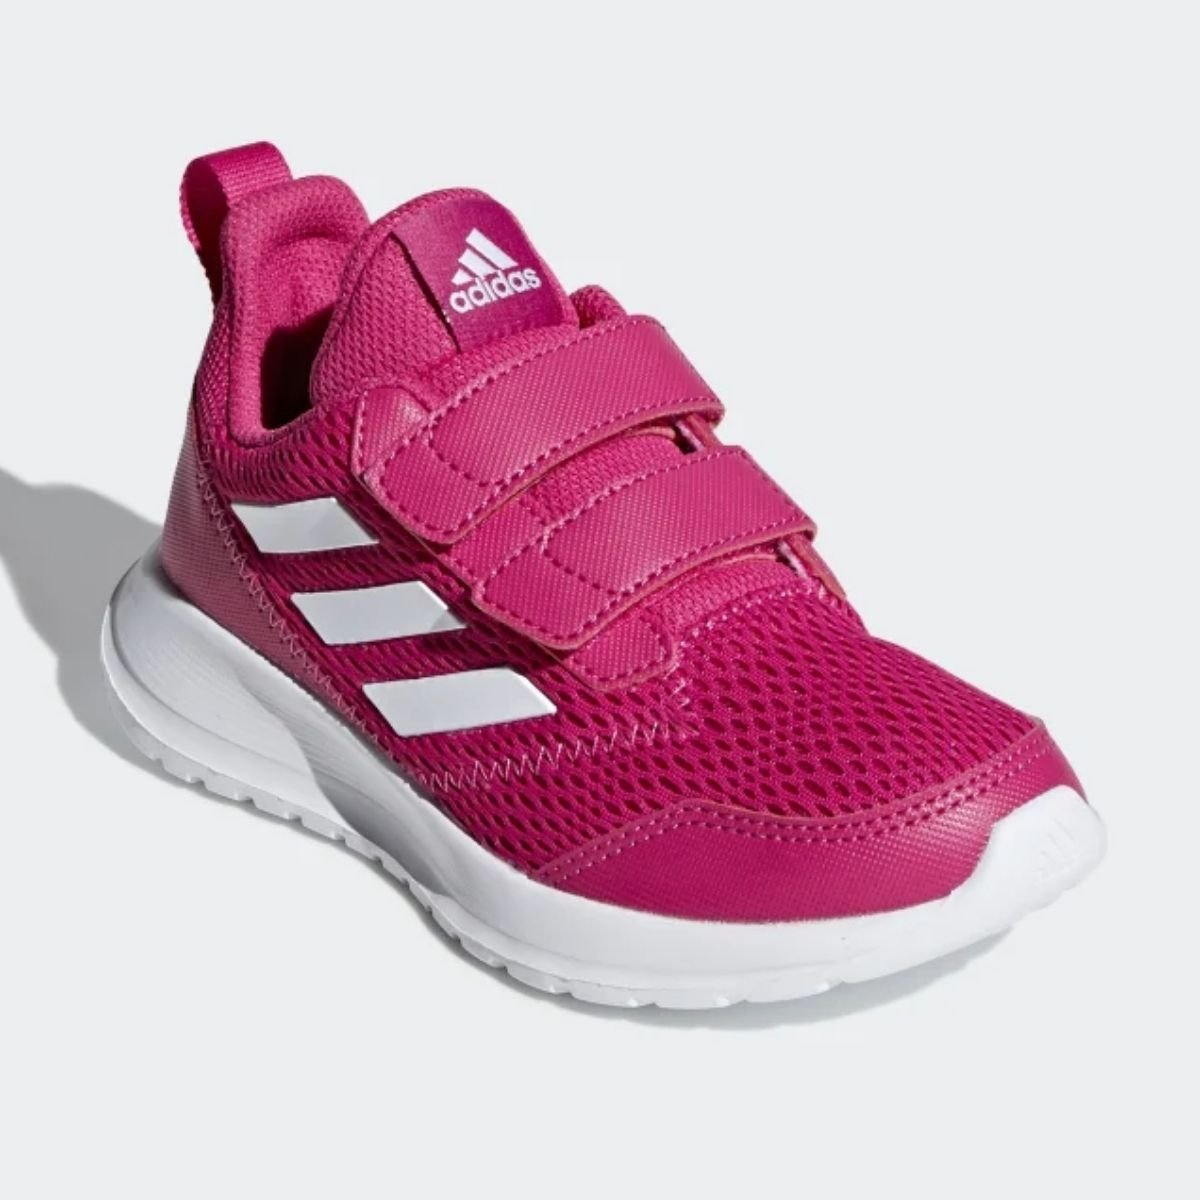 Scarpa Adidas Altarun...